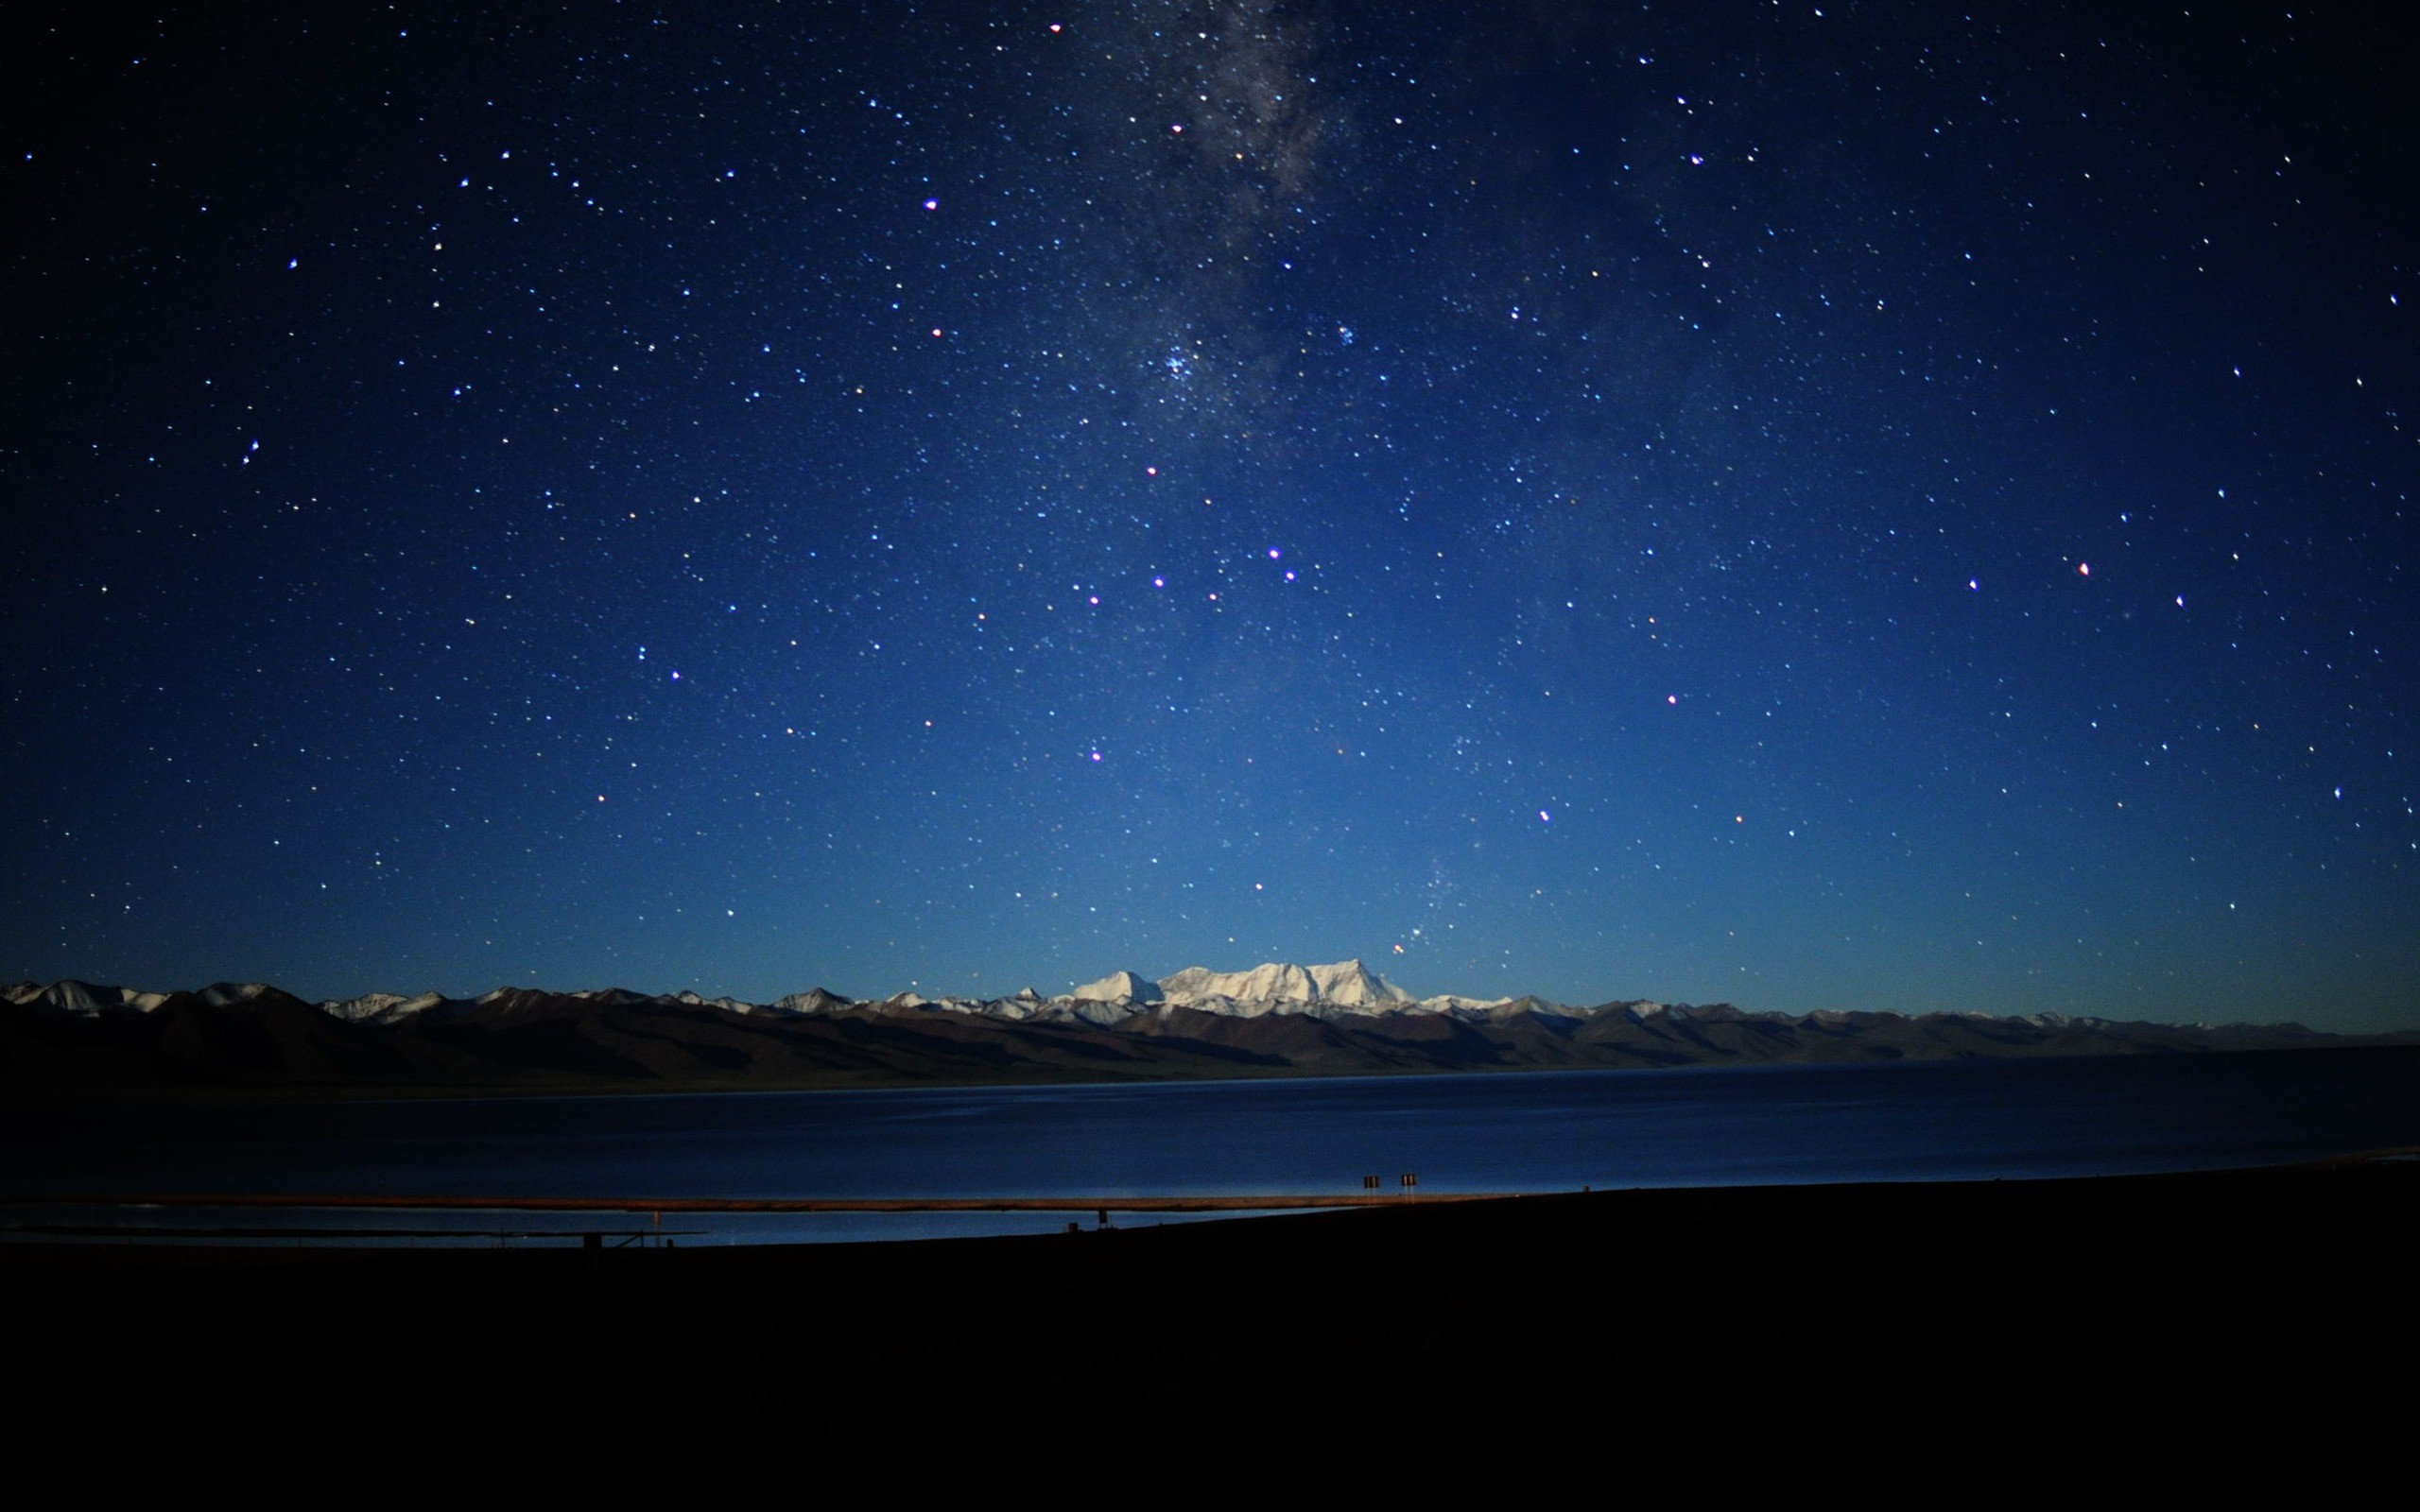 … Night Sky Background High resolution night sky background wallpaper  free powerpoint background